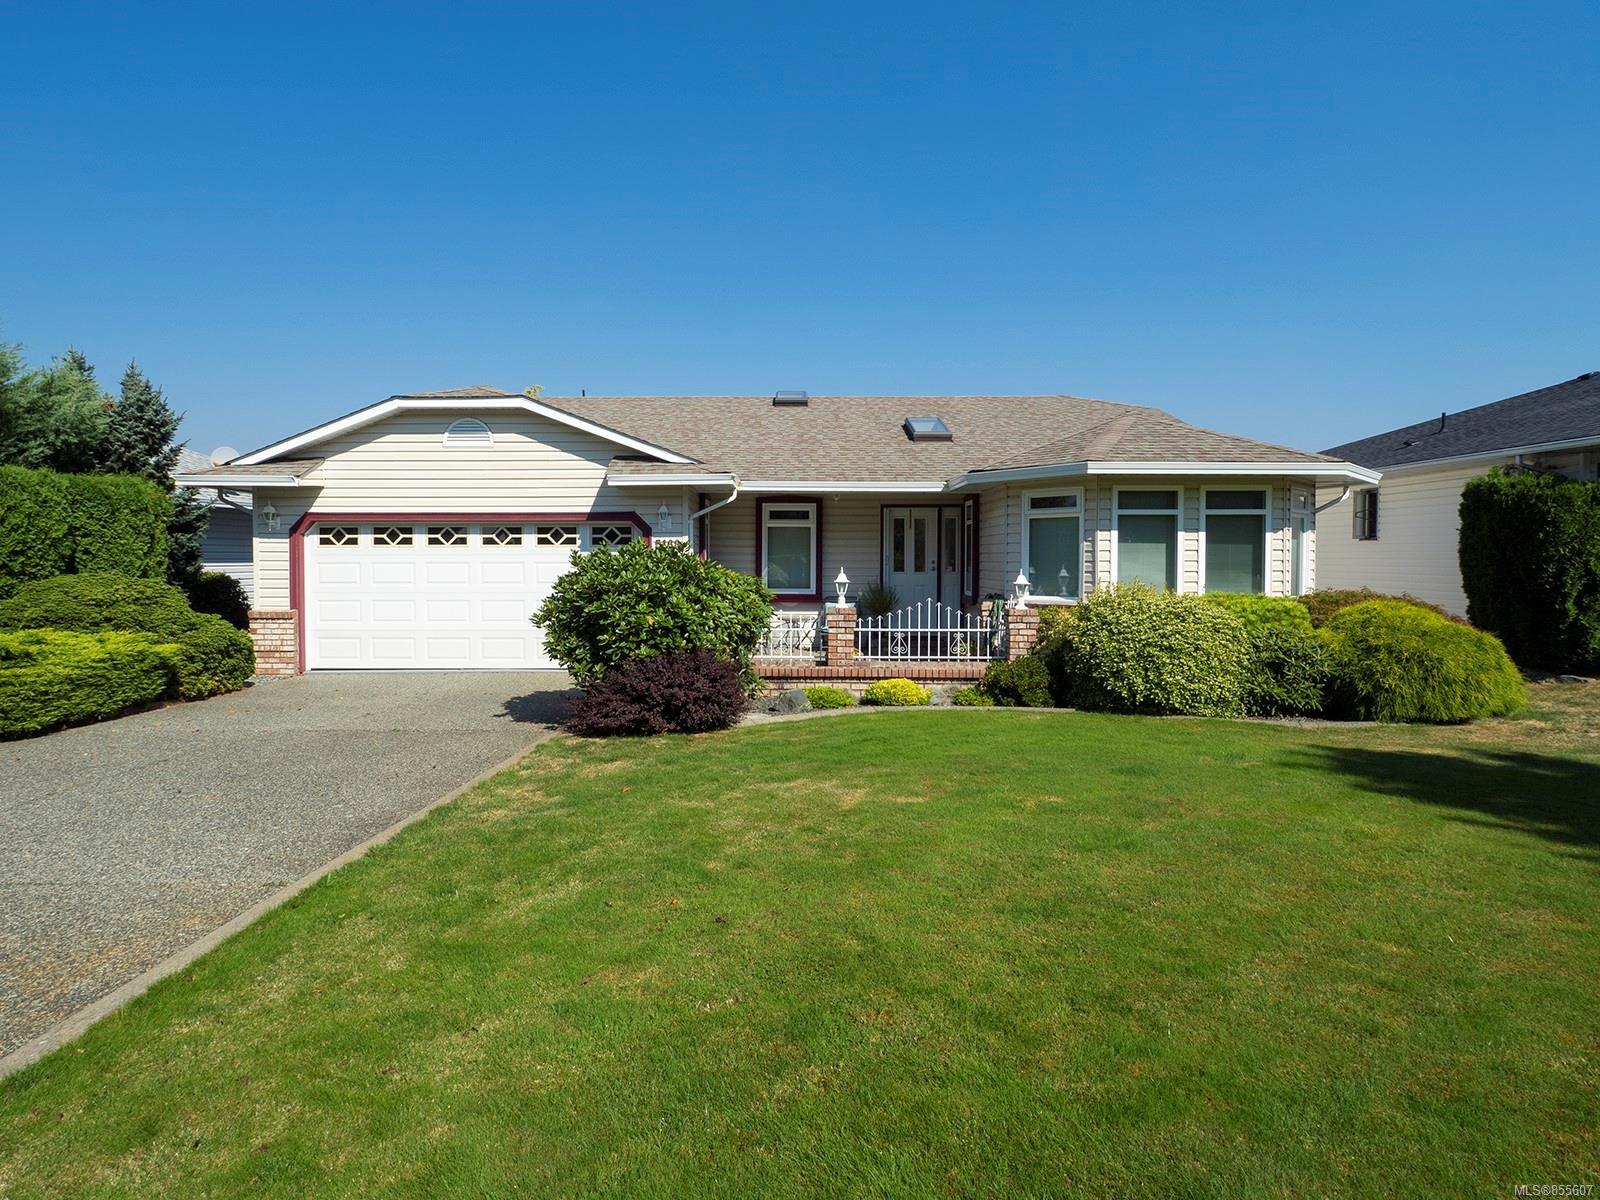 Main Photo: 5168 Coach House Dr in : Na North Nanaimo House for sale (Nanaimo)  : MLS®# 855607